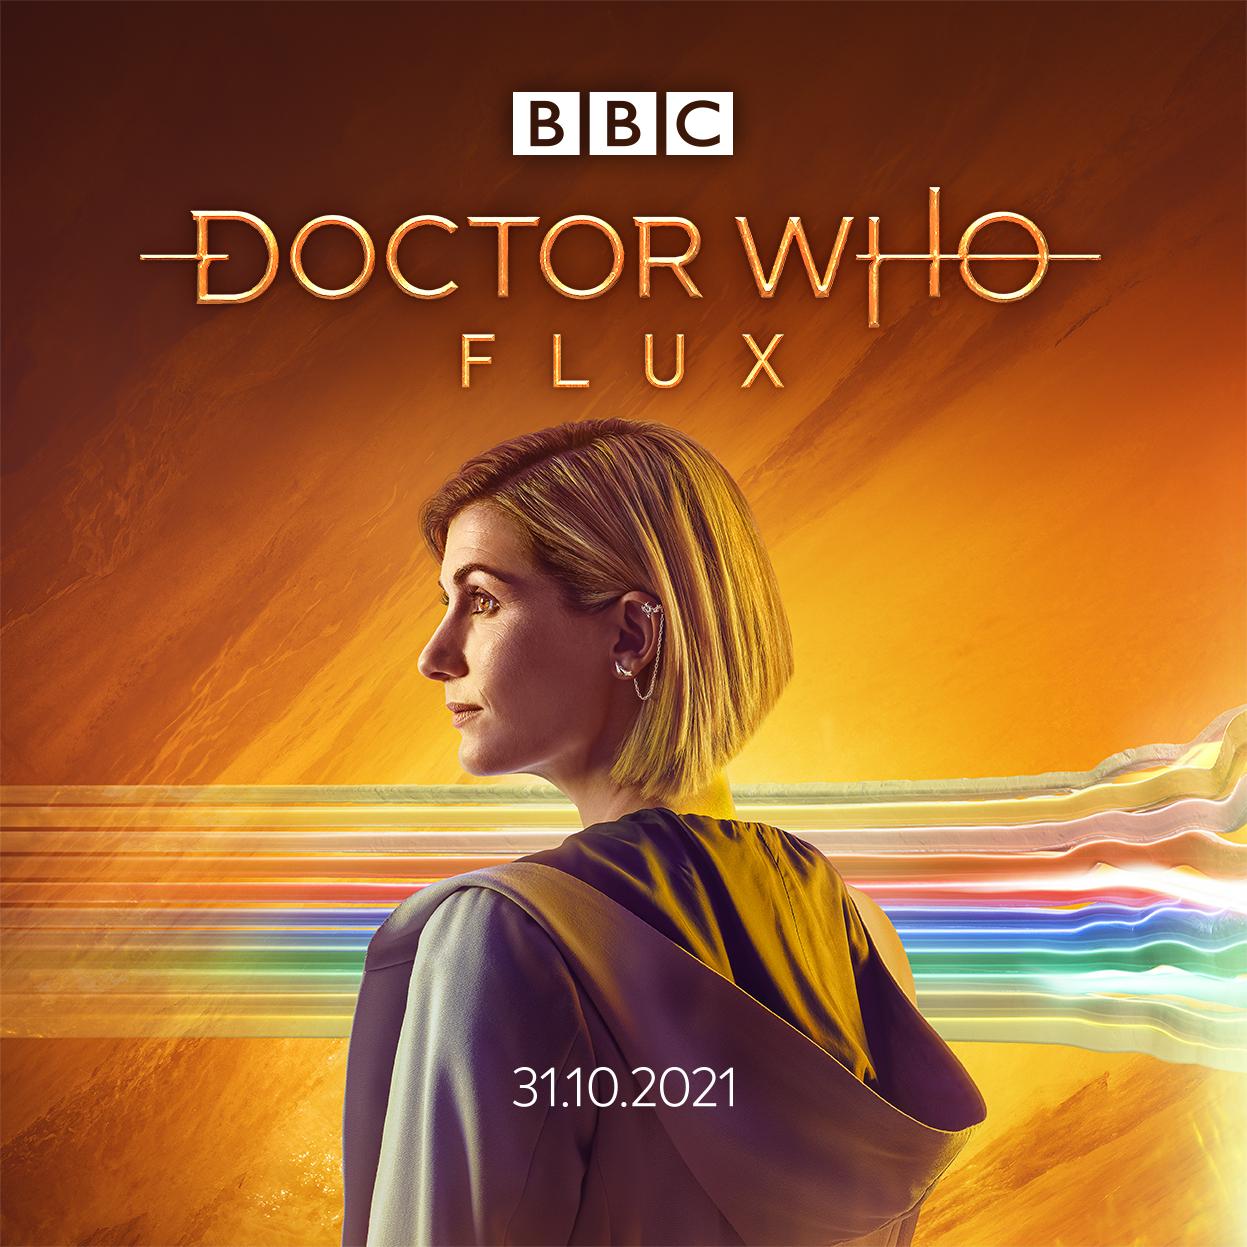 Series 13 premiere date announced